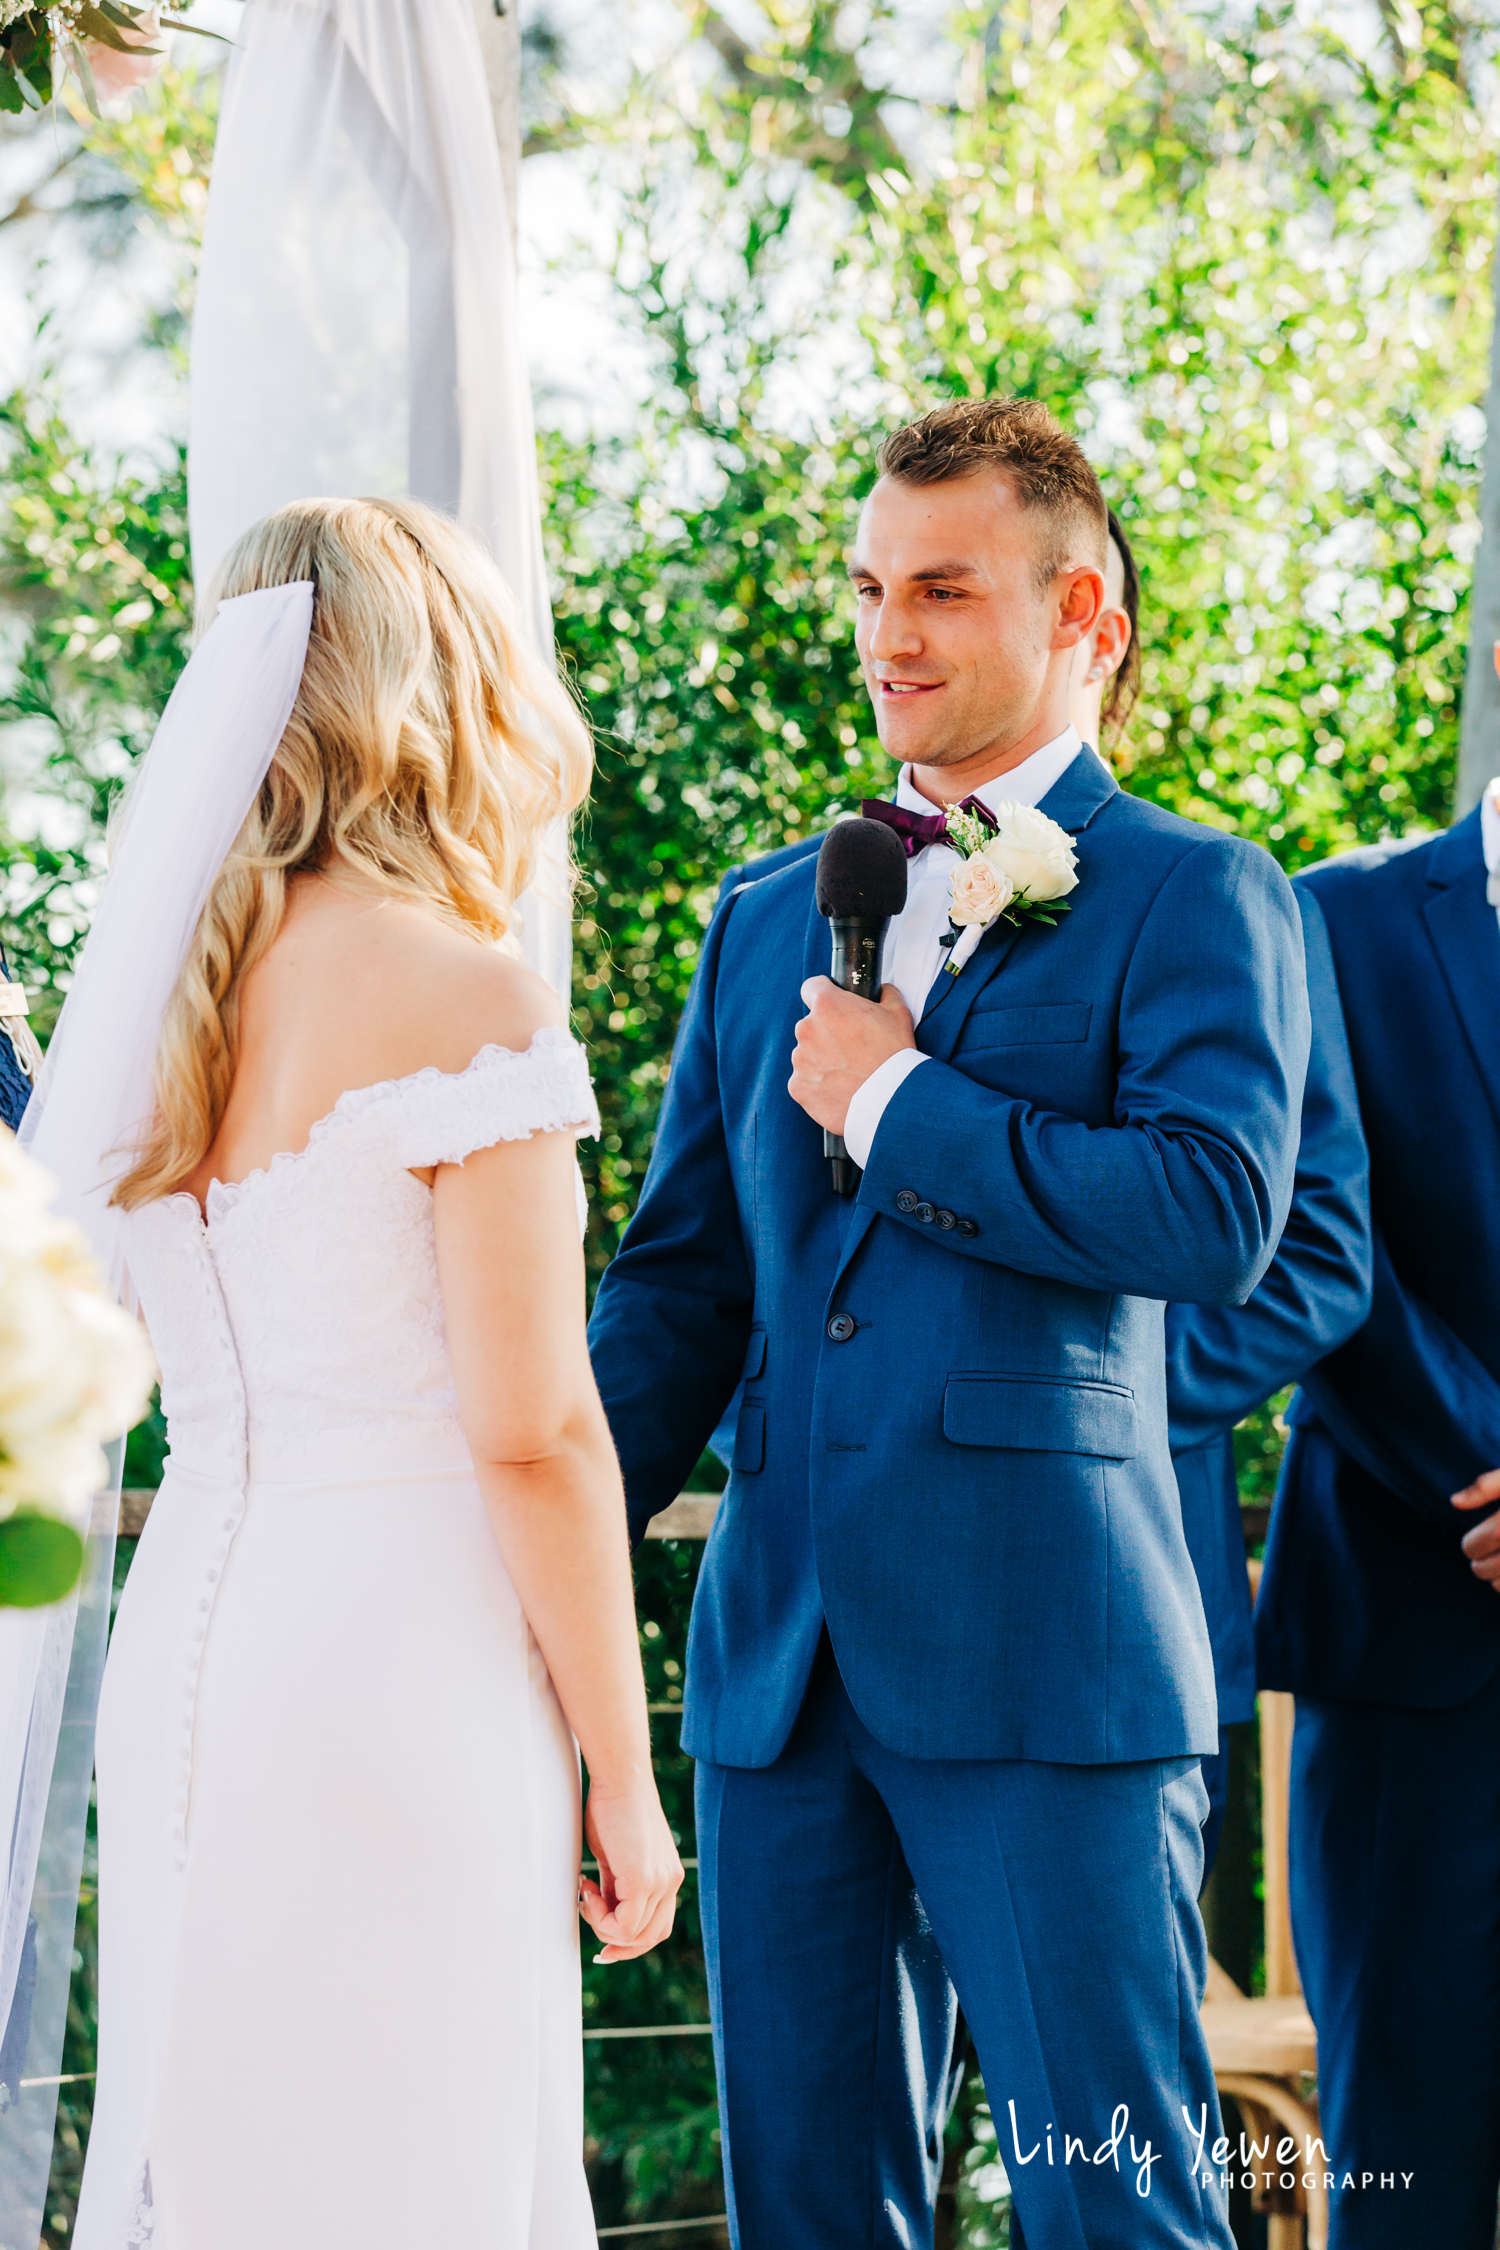 Rocks-Yandina-Weddings-Jess-Jake 200.jpg